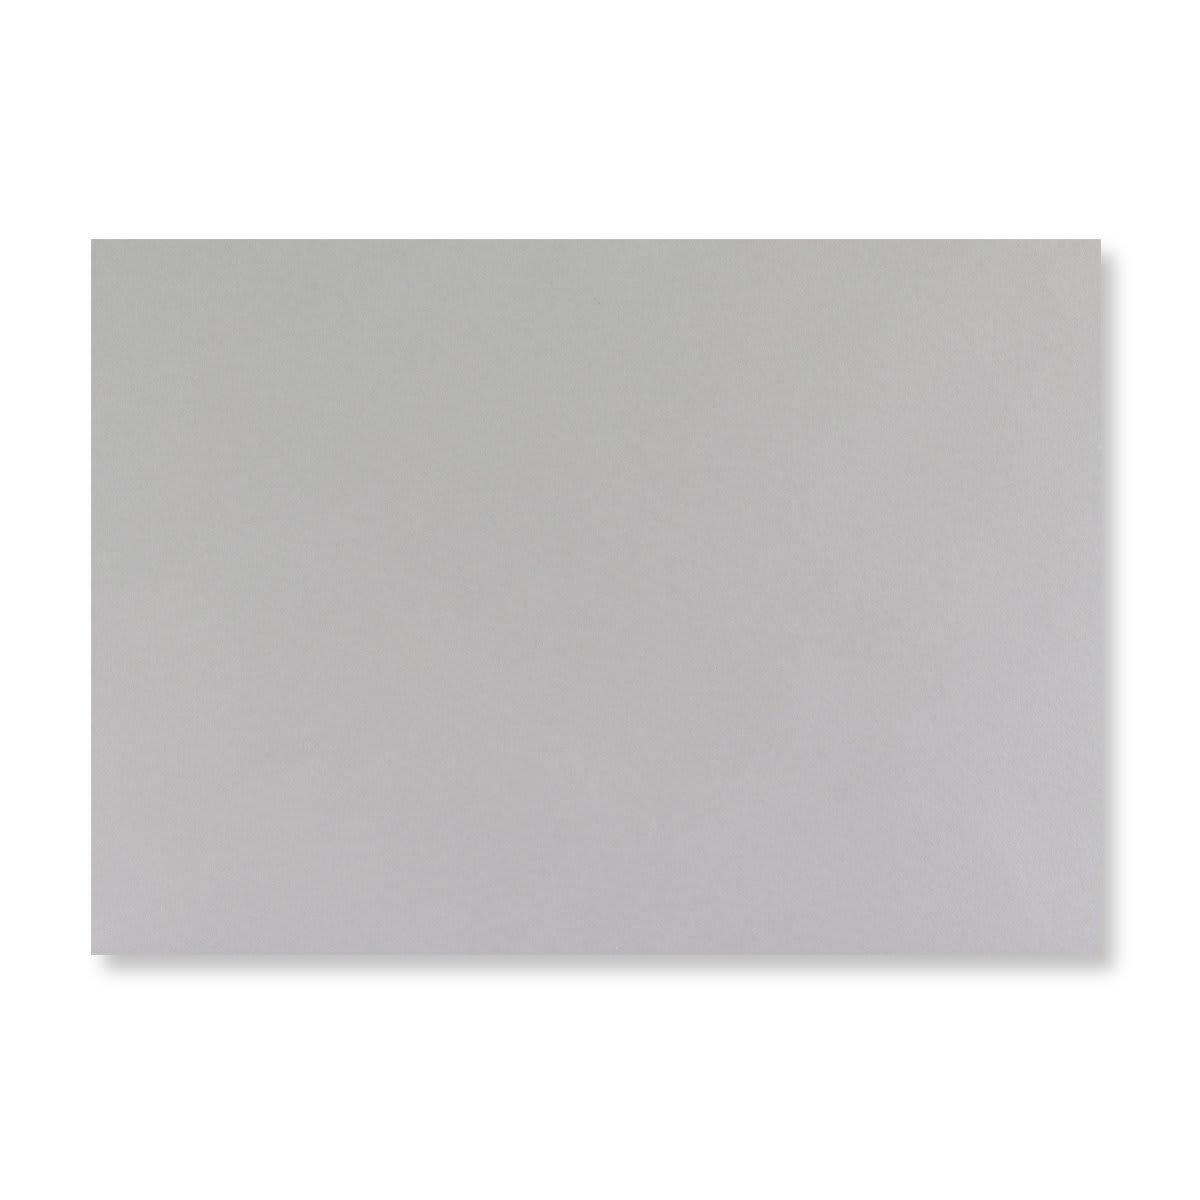 LIGHT GREY 125 x 175 ENVELOPES 120GSM